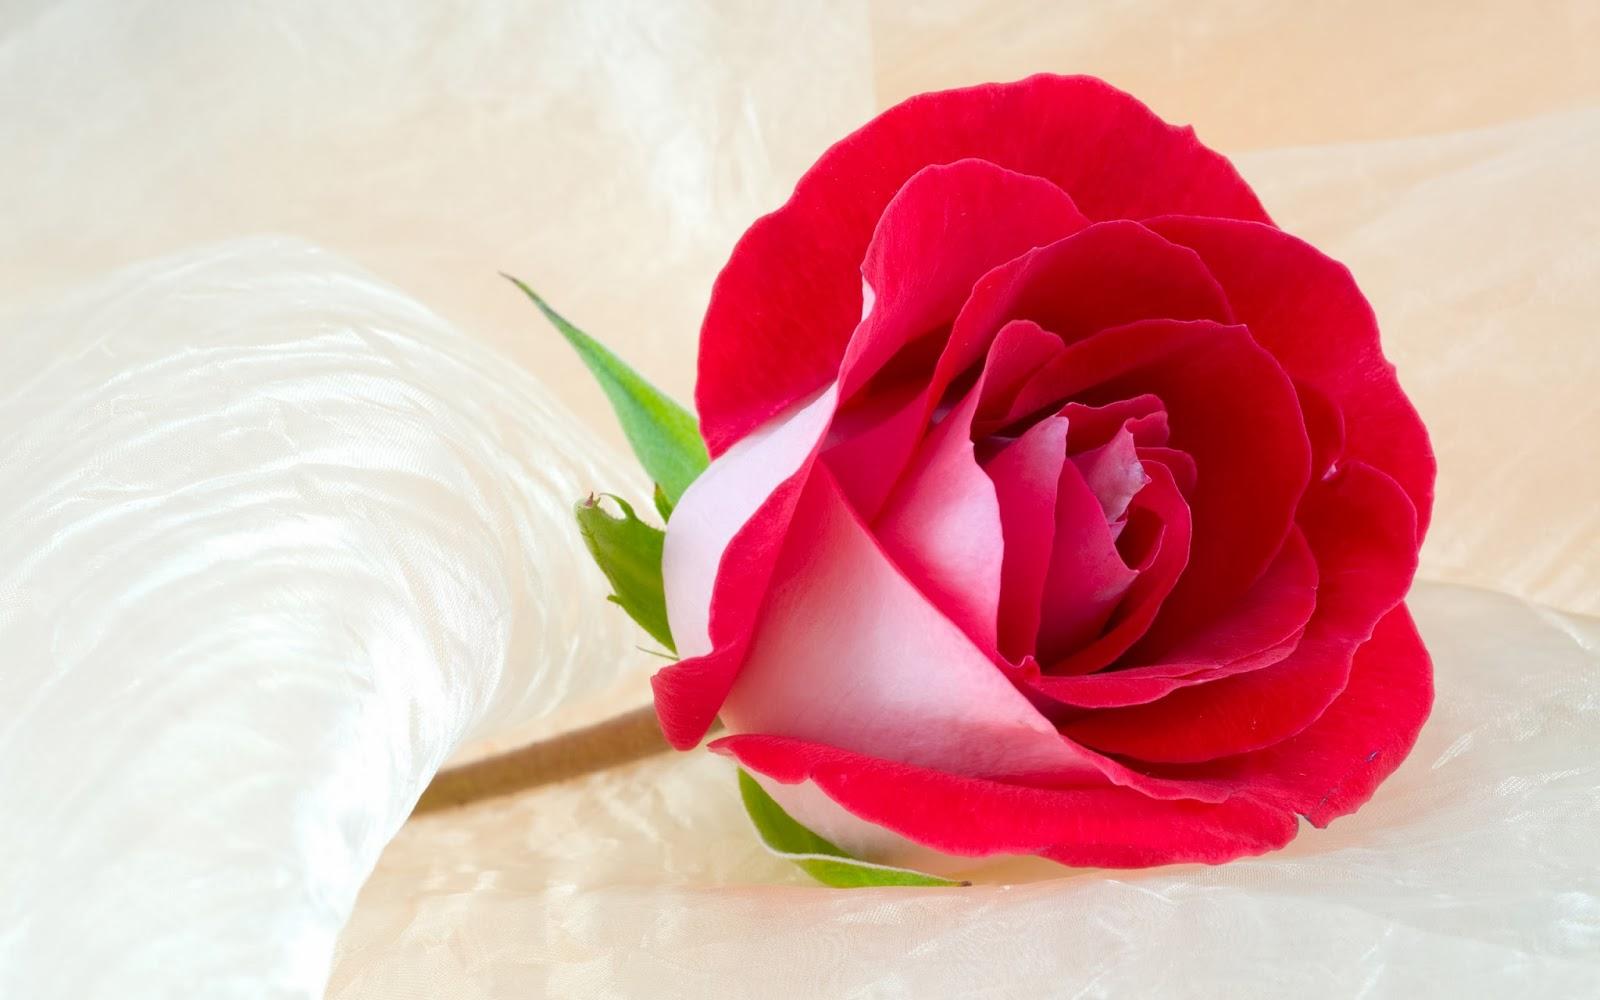 Best 10 Beautiful Flowers Fresh Hd Wallpapers 2014 World